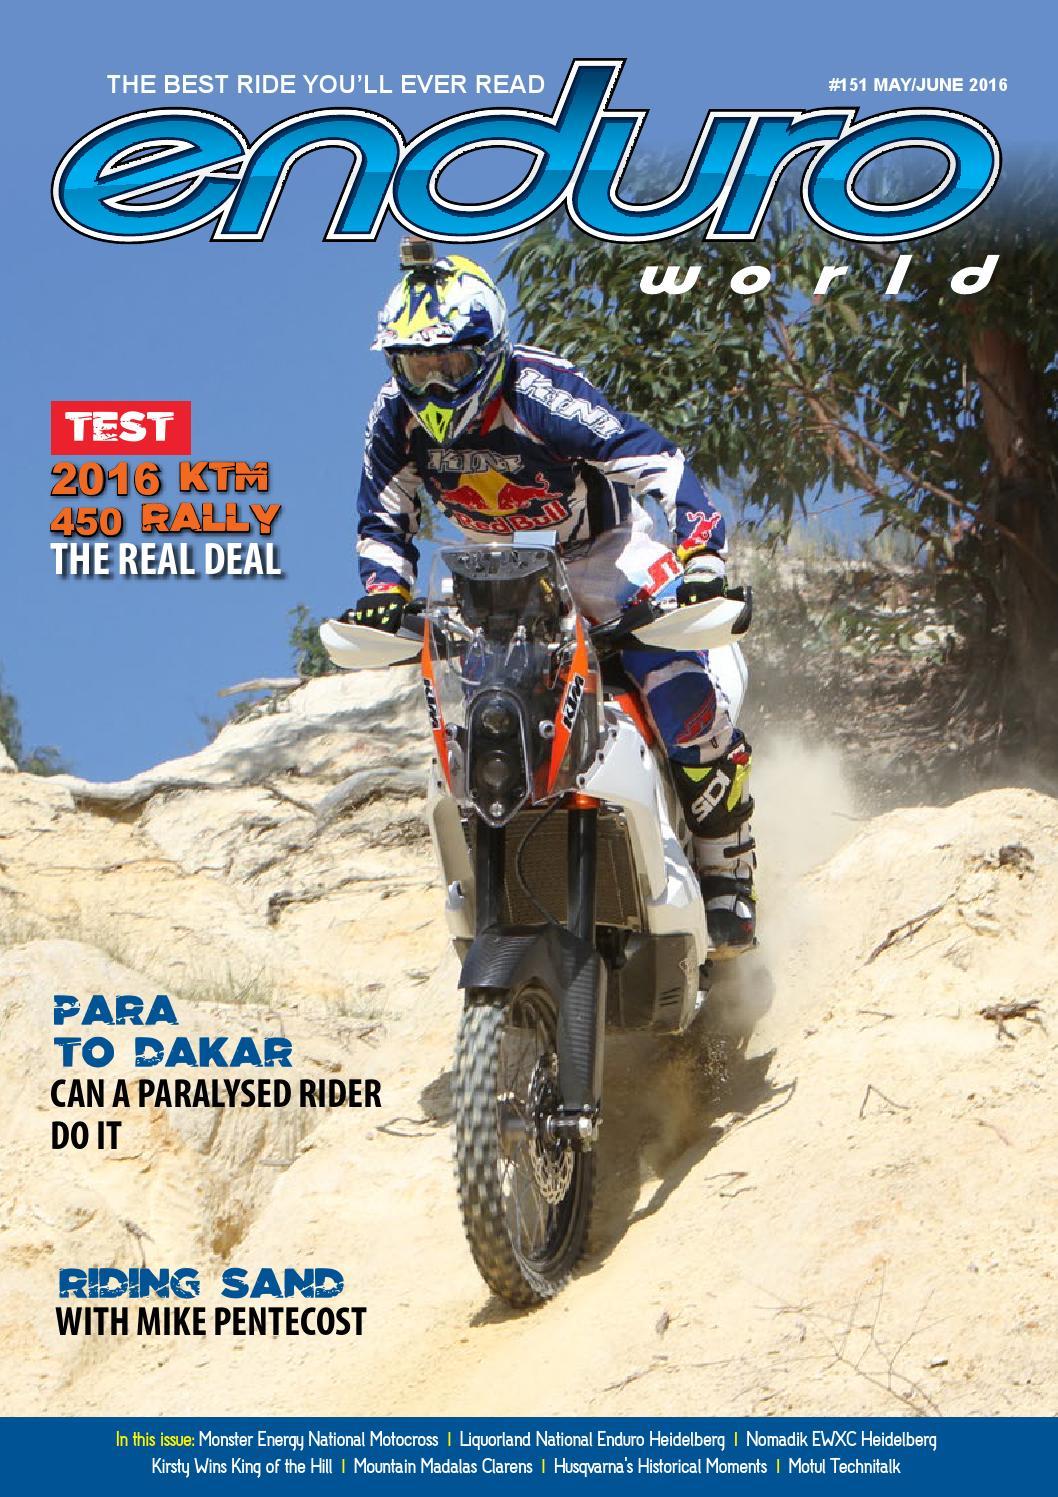 Enduro World May June 2016 Issuu By Magazine Scop Air Rx King Original